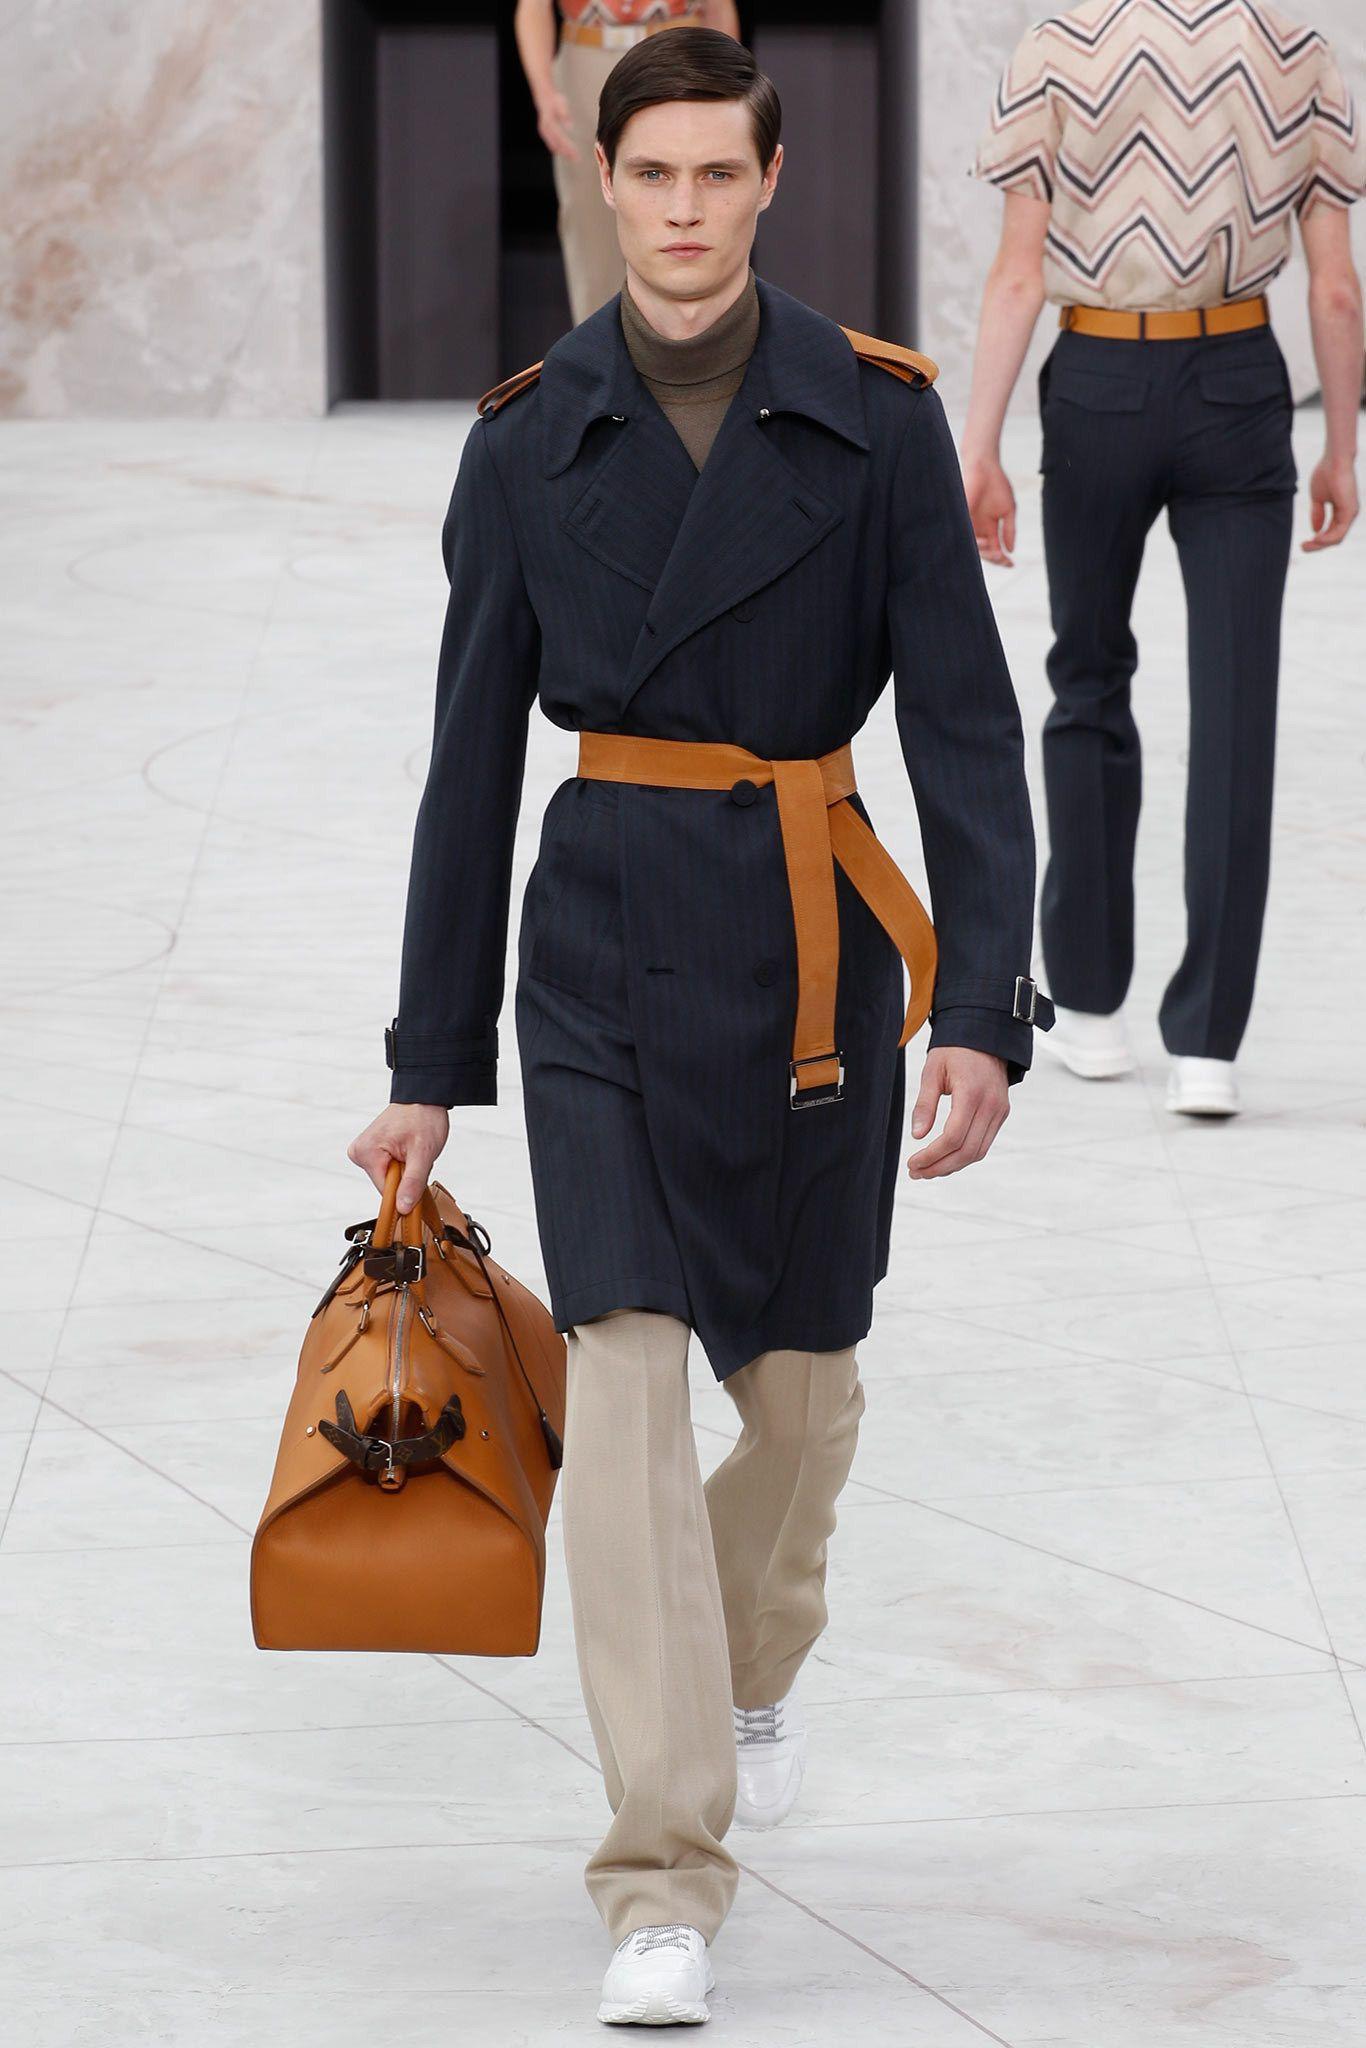 Louis Vuitton Spring 2015 Menswear Fashion Show